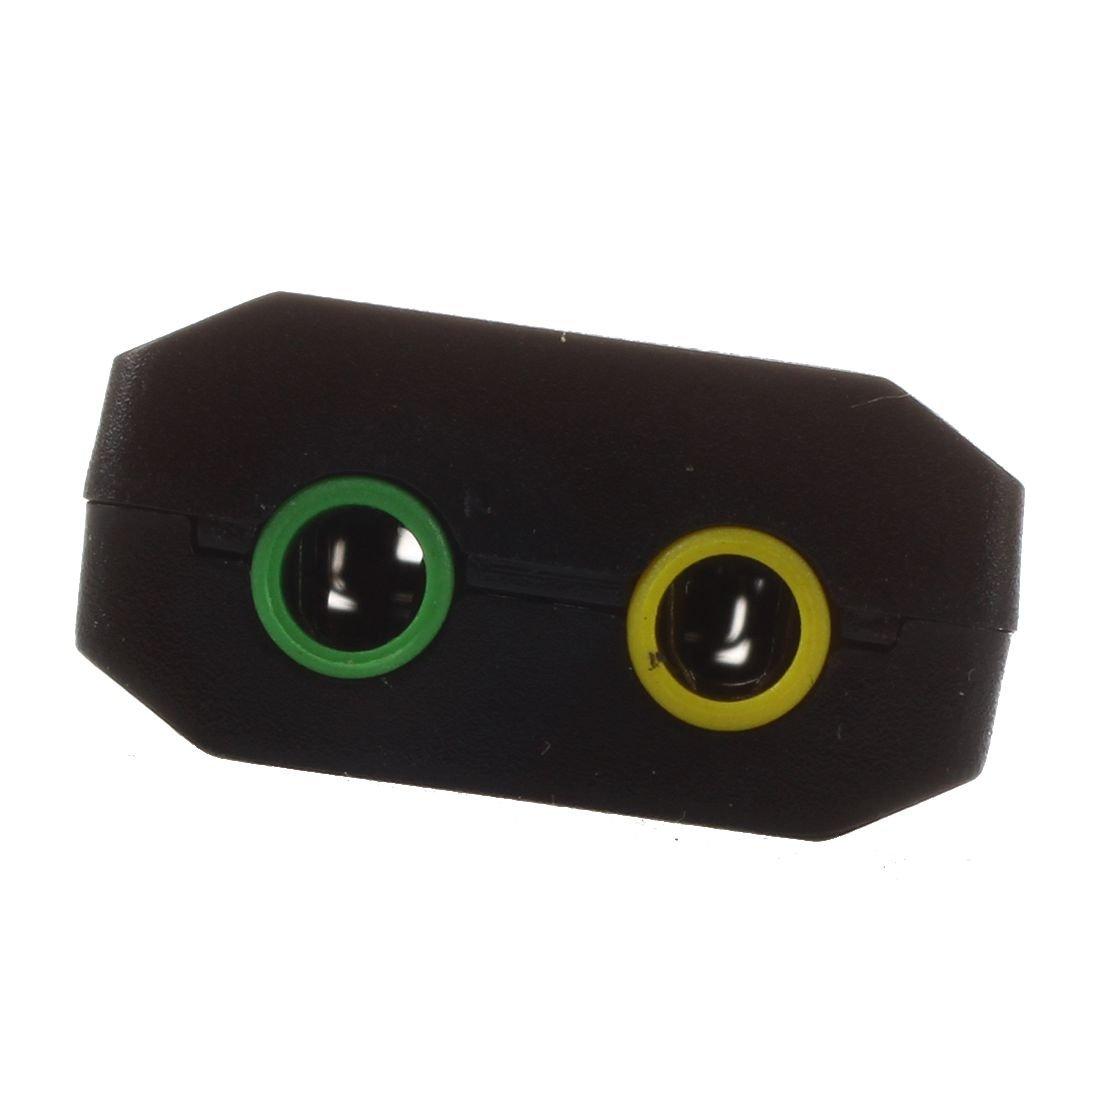 Cikuso USB 3D Audio Sound Card miniphone Earphone Adapter